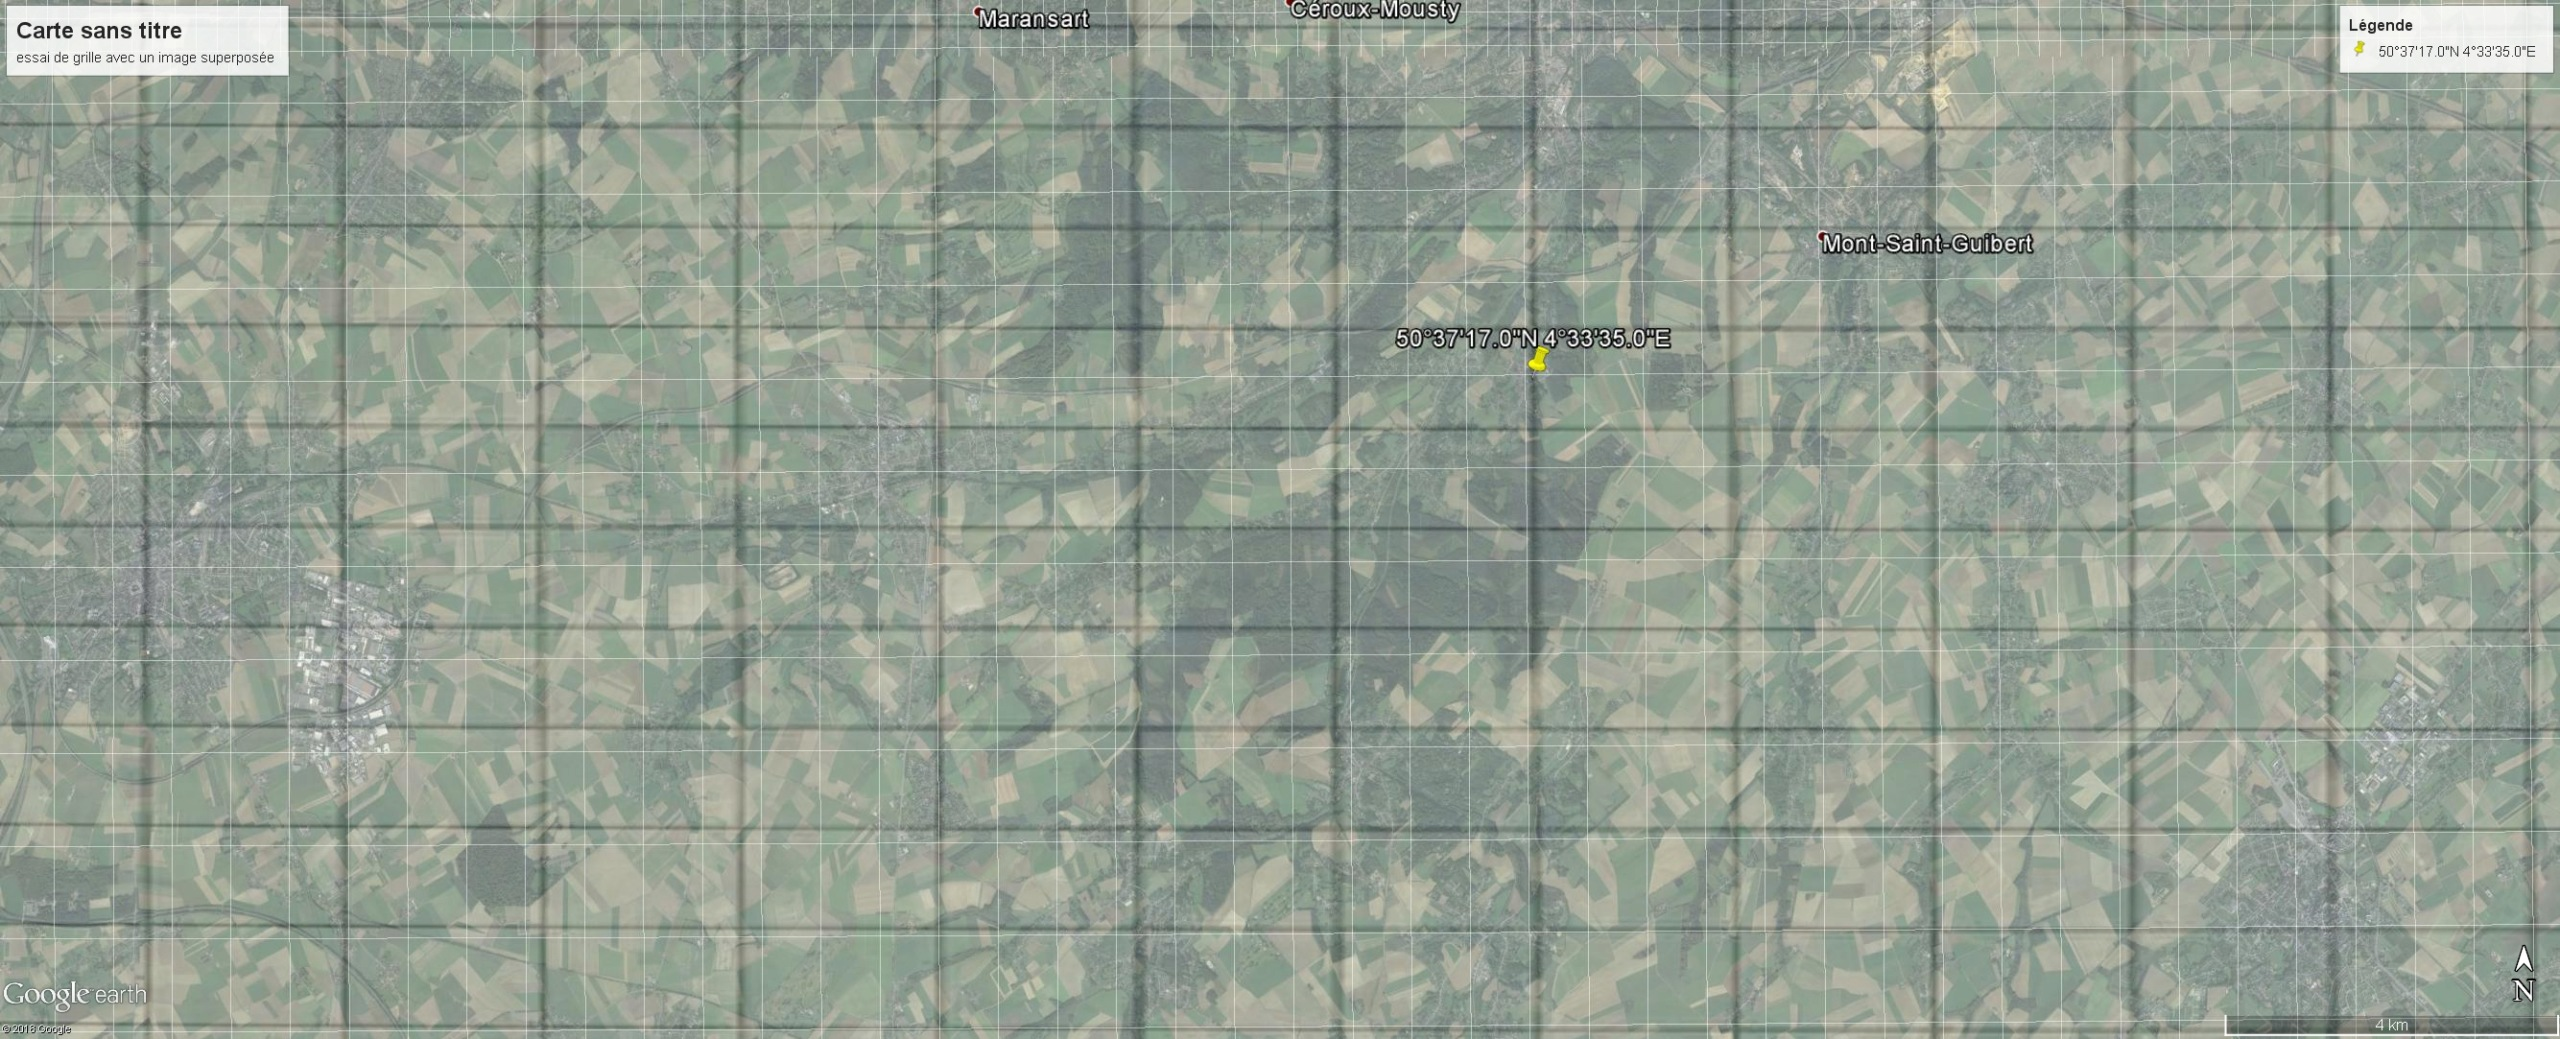 [Résolu] Quadrillage dans Google Earth Essai_10